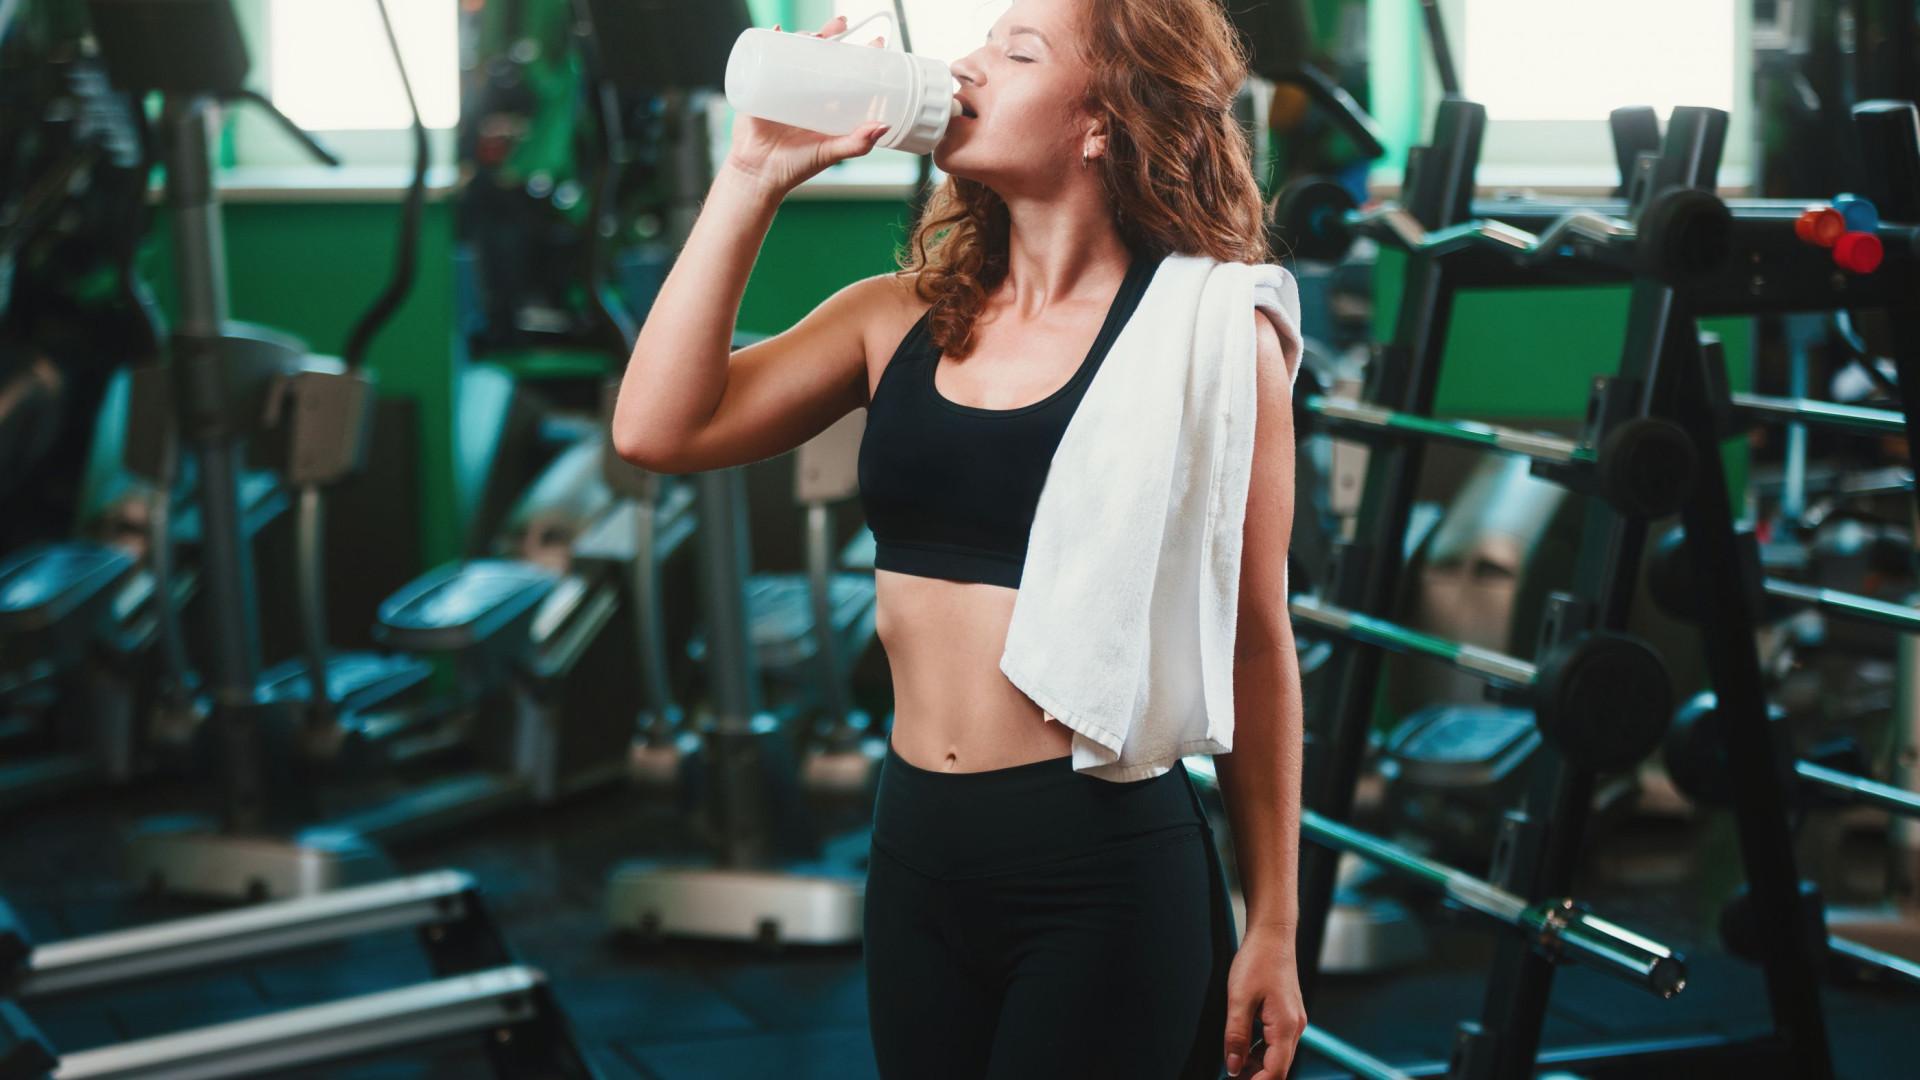 Será que deve mesmo beber batidos de proteína após o treino?